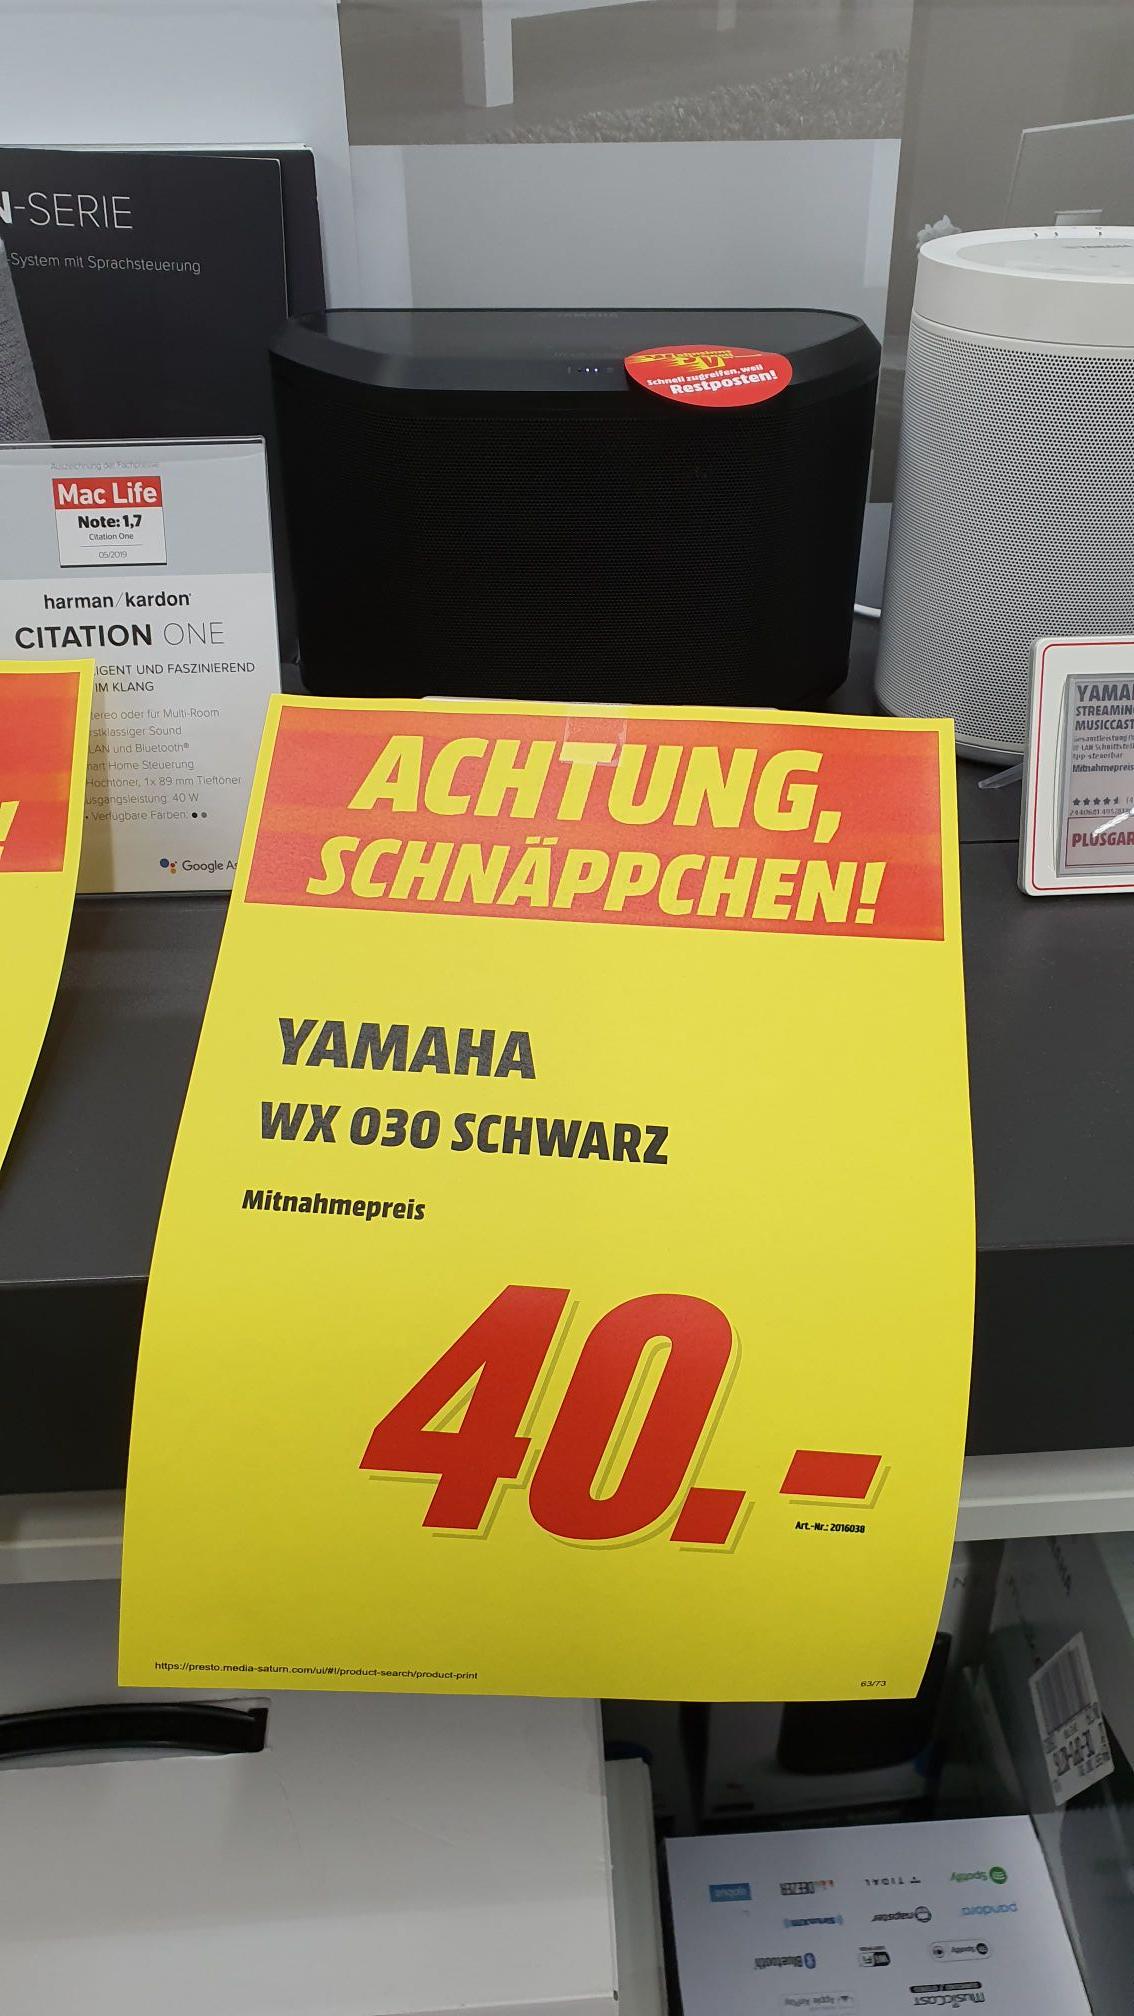 [Lokal] MM Offenburg - Yamaha wx 030 für 40€, harman kardon citation one für 90 €